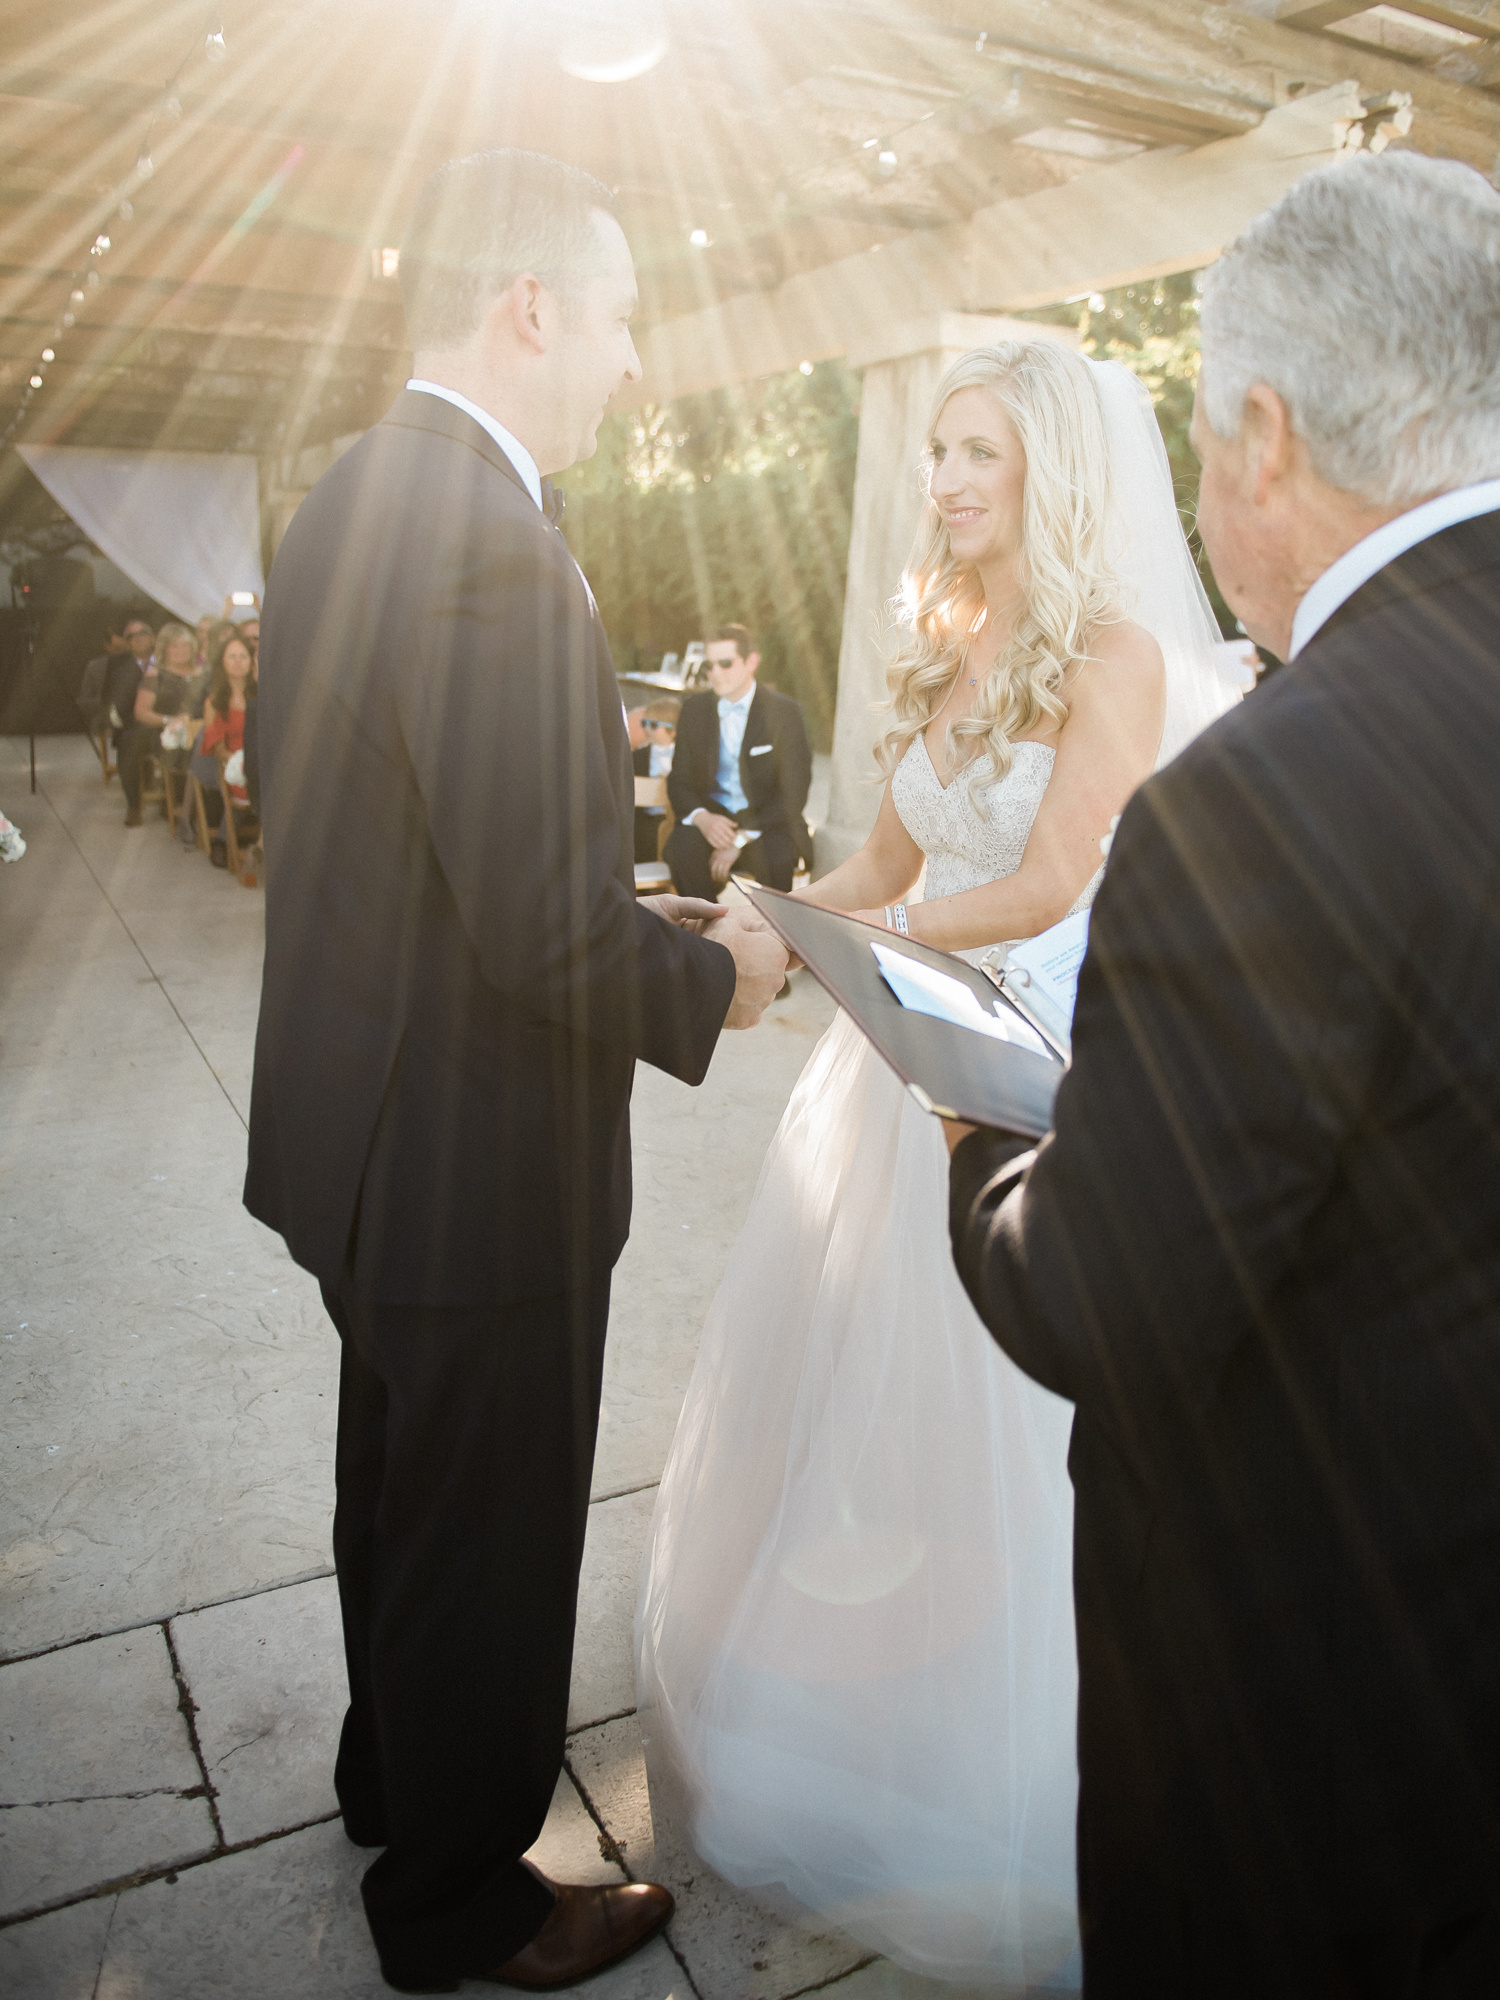 Aimee+Logan_wedding_spp-102.jpg